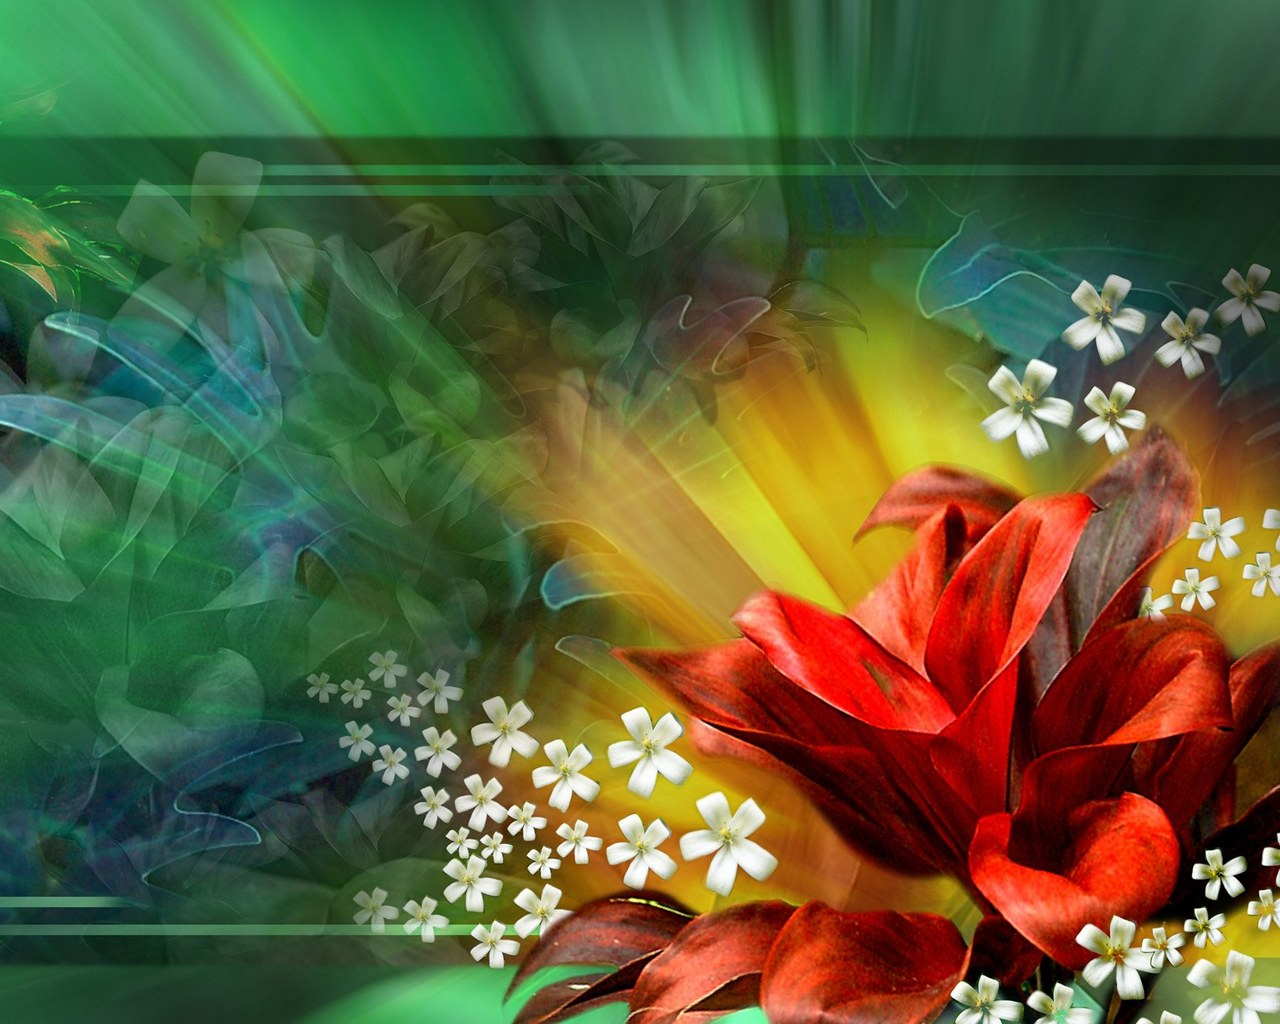 http://2.bp.blogspot.com/-Iv1o6shdMPo/T8h677RnOtI/AAAAAAAADxw/xdynLzbitd4/s1600/desktop-wallpaper-17.jpg